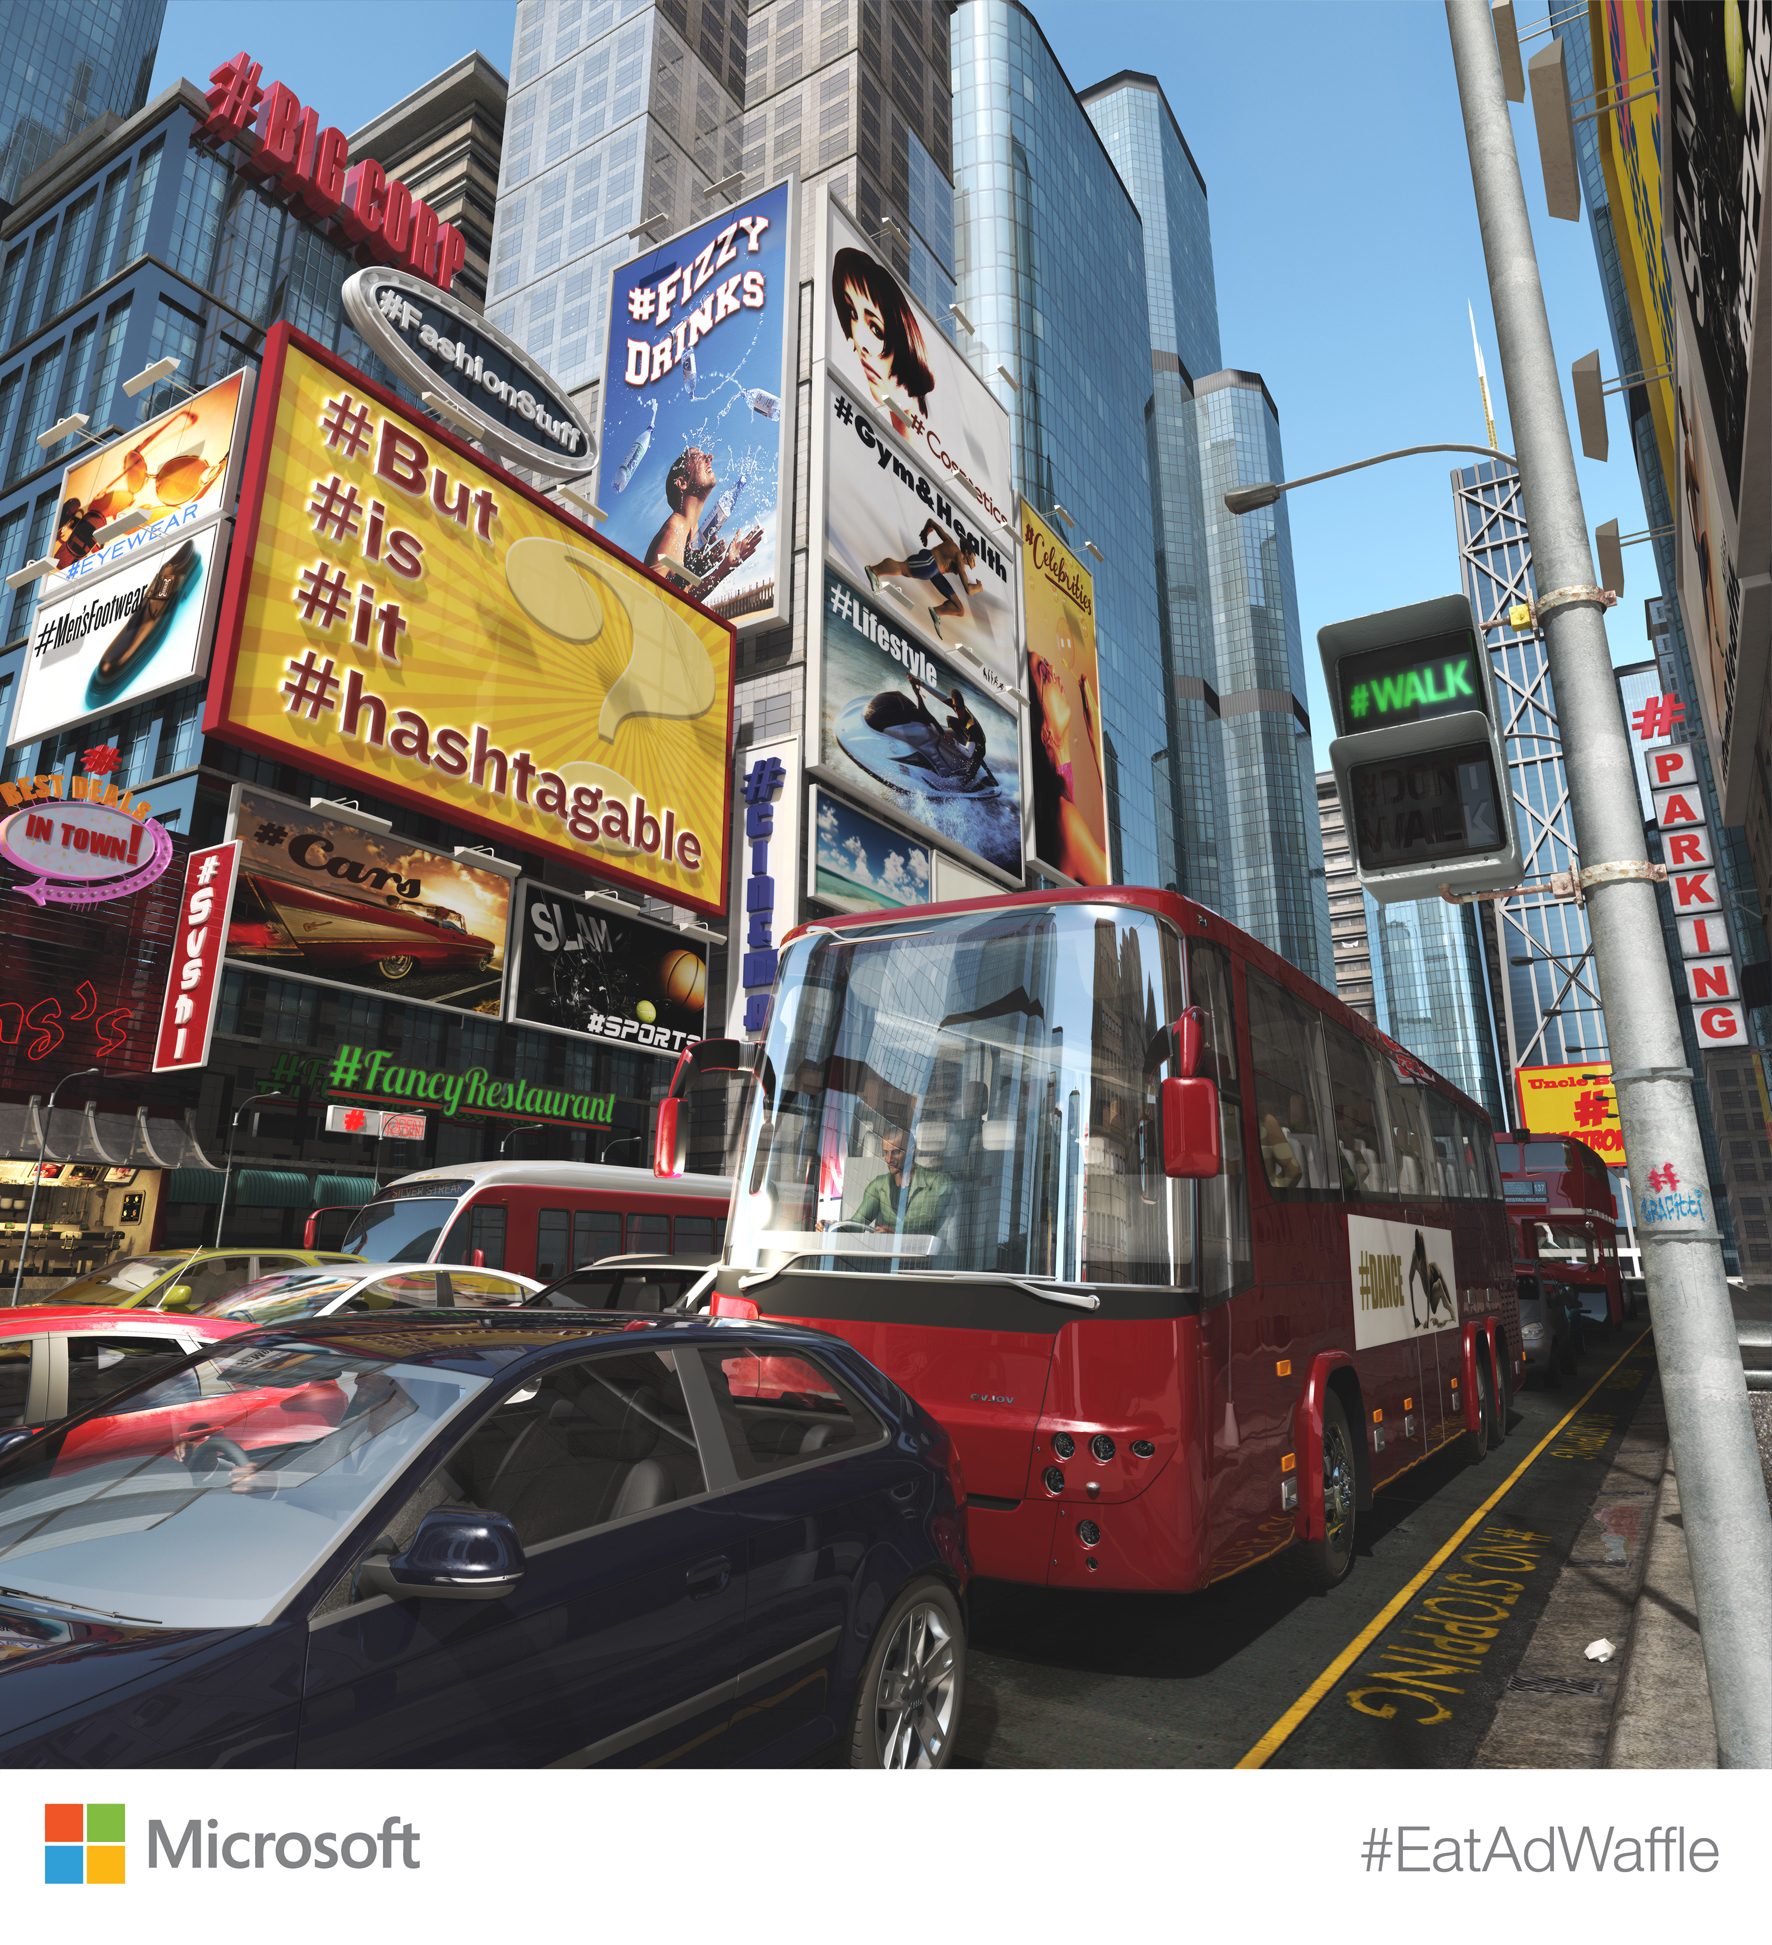 Hashtagable / Microsoft UK